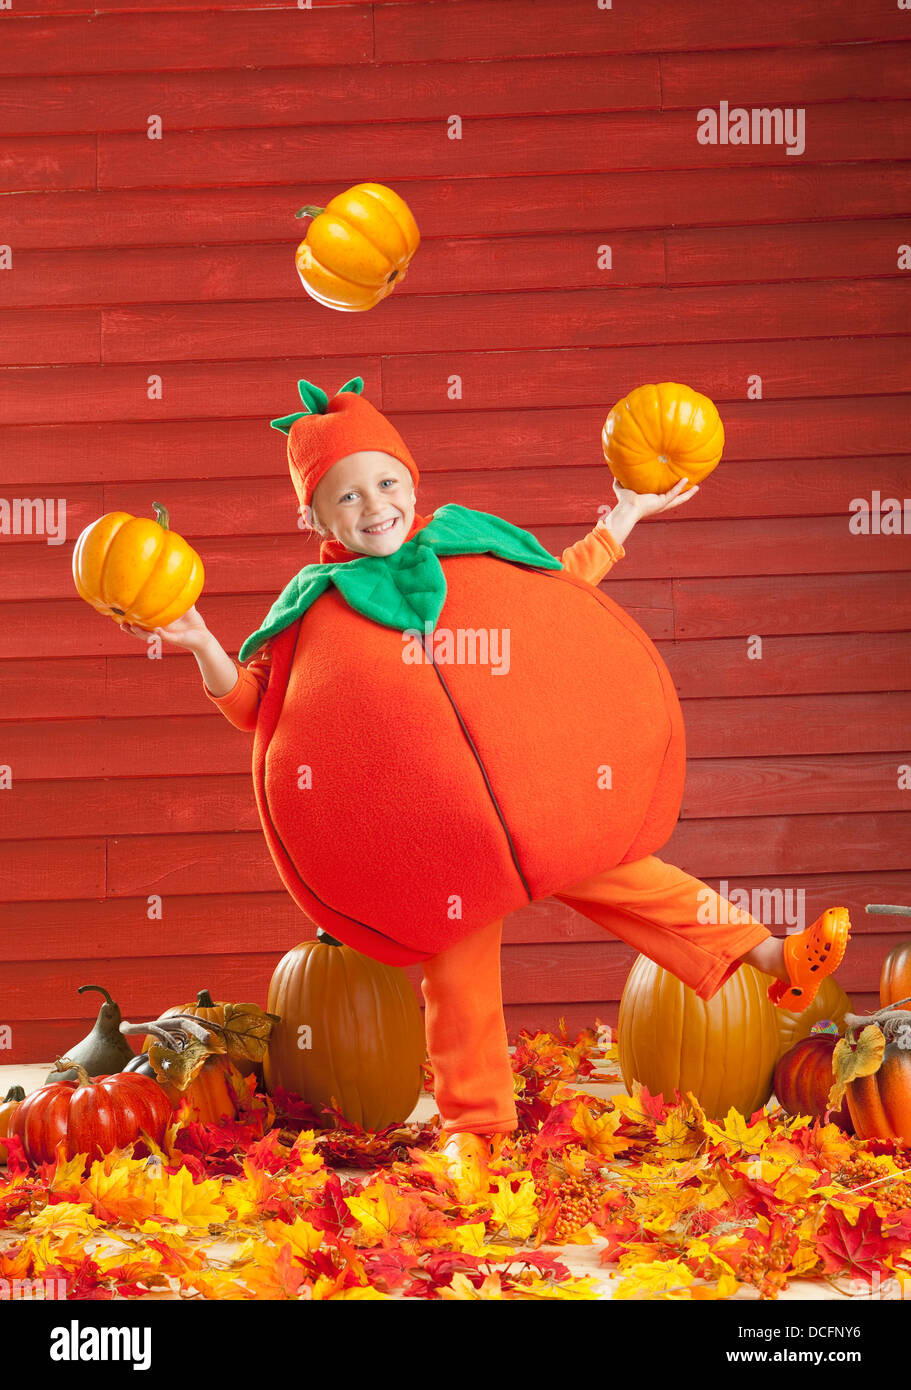 A Child In A Pumpkin Costume Juggling Pumpkins; Three Hills, Alberta, Canada - Stock Image